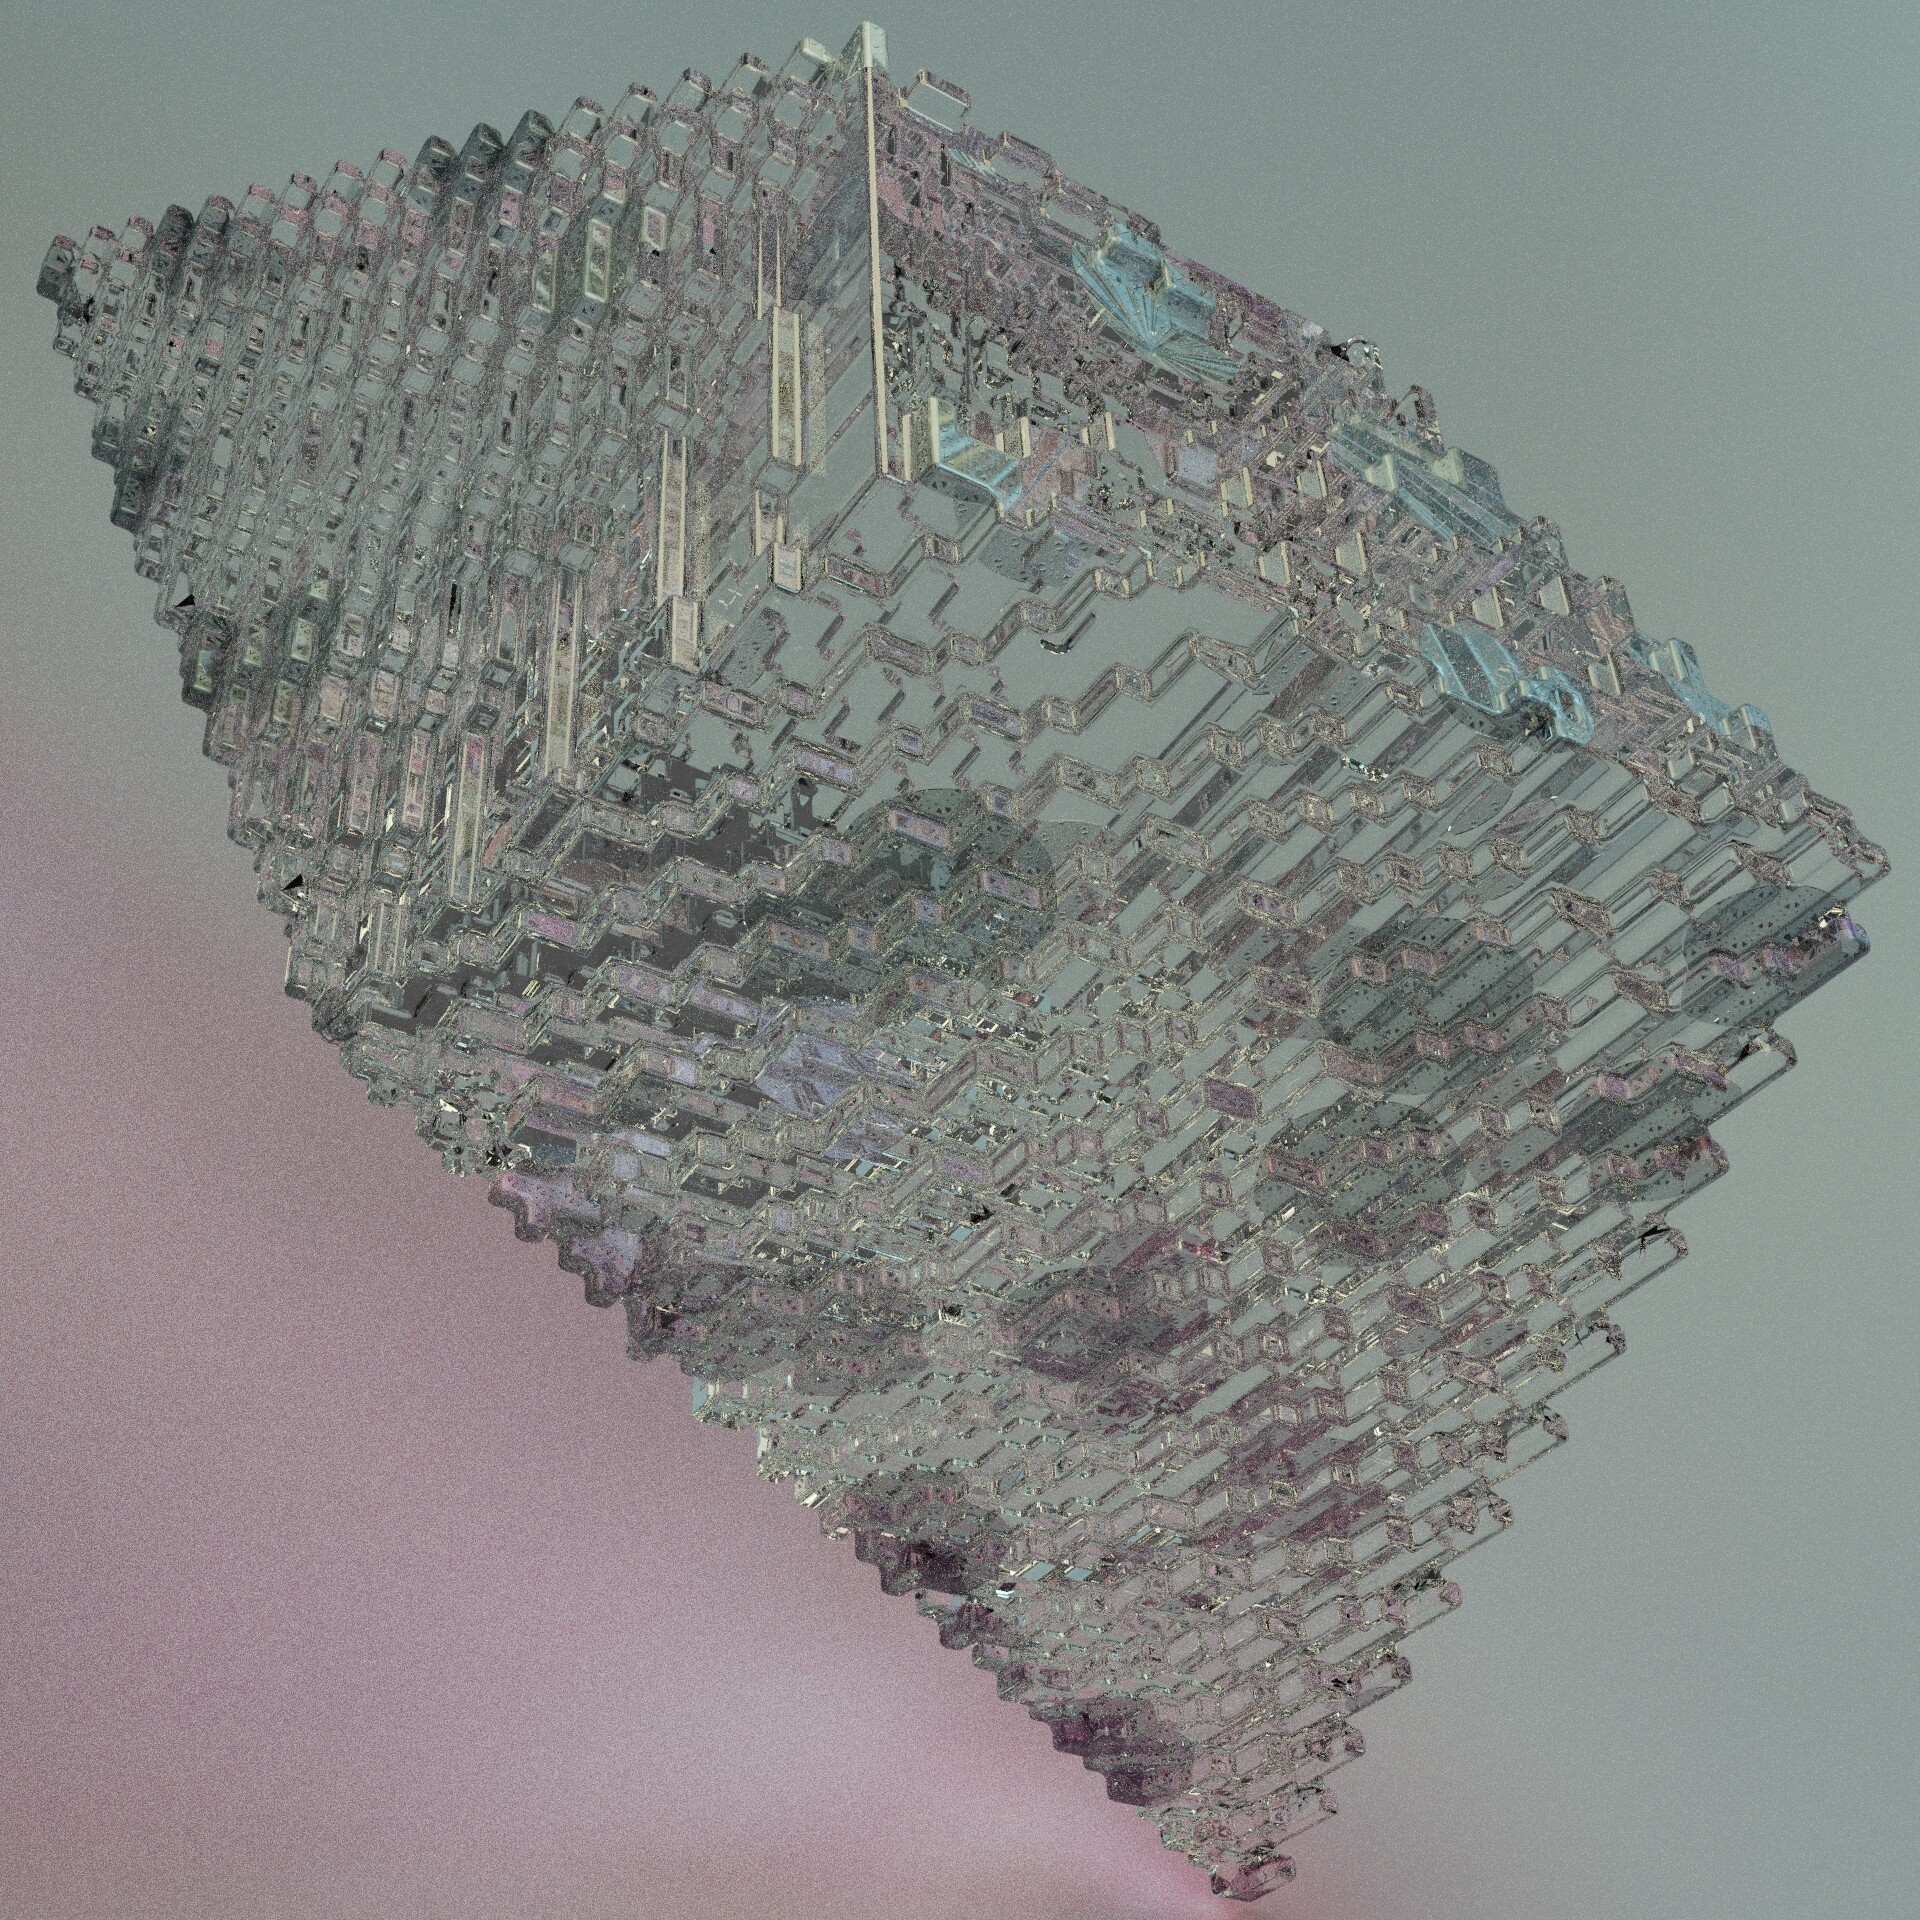 alexander-volkov-cube-anisotropic.jpg?15